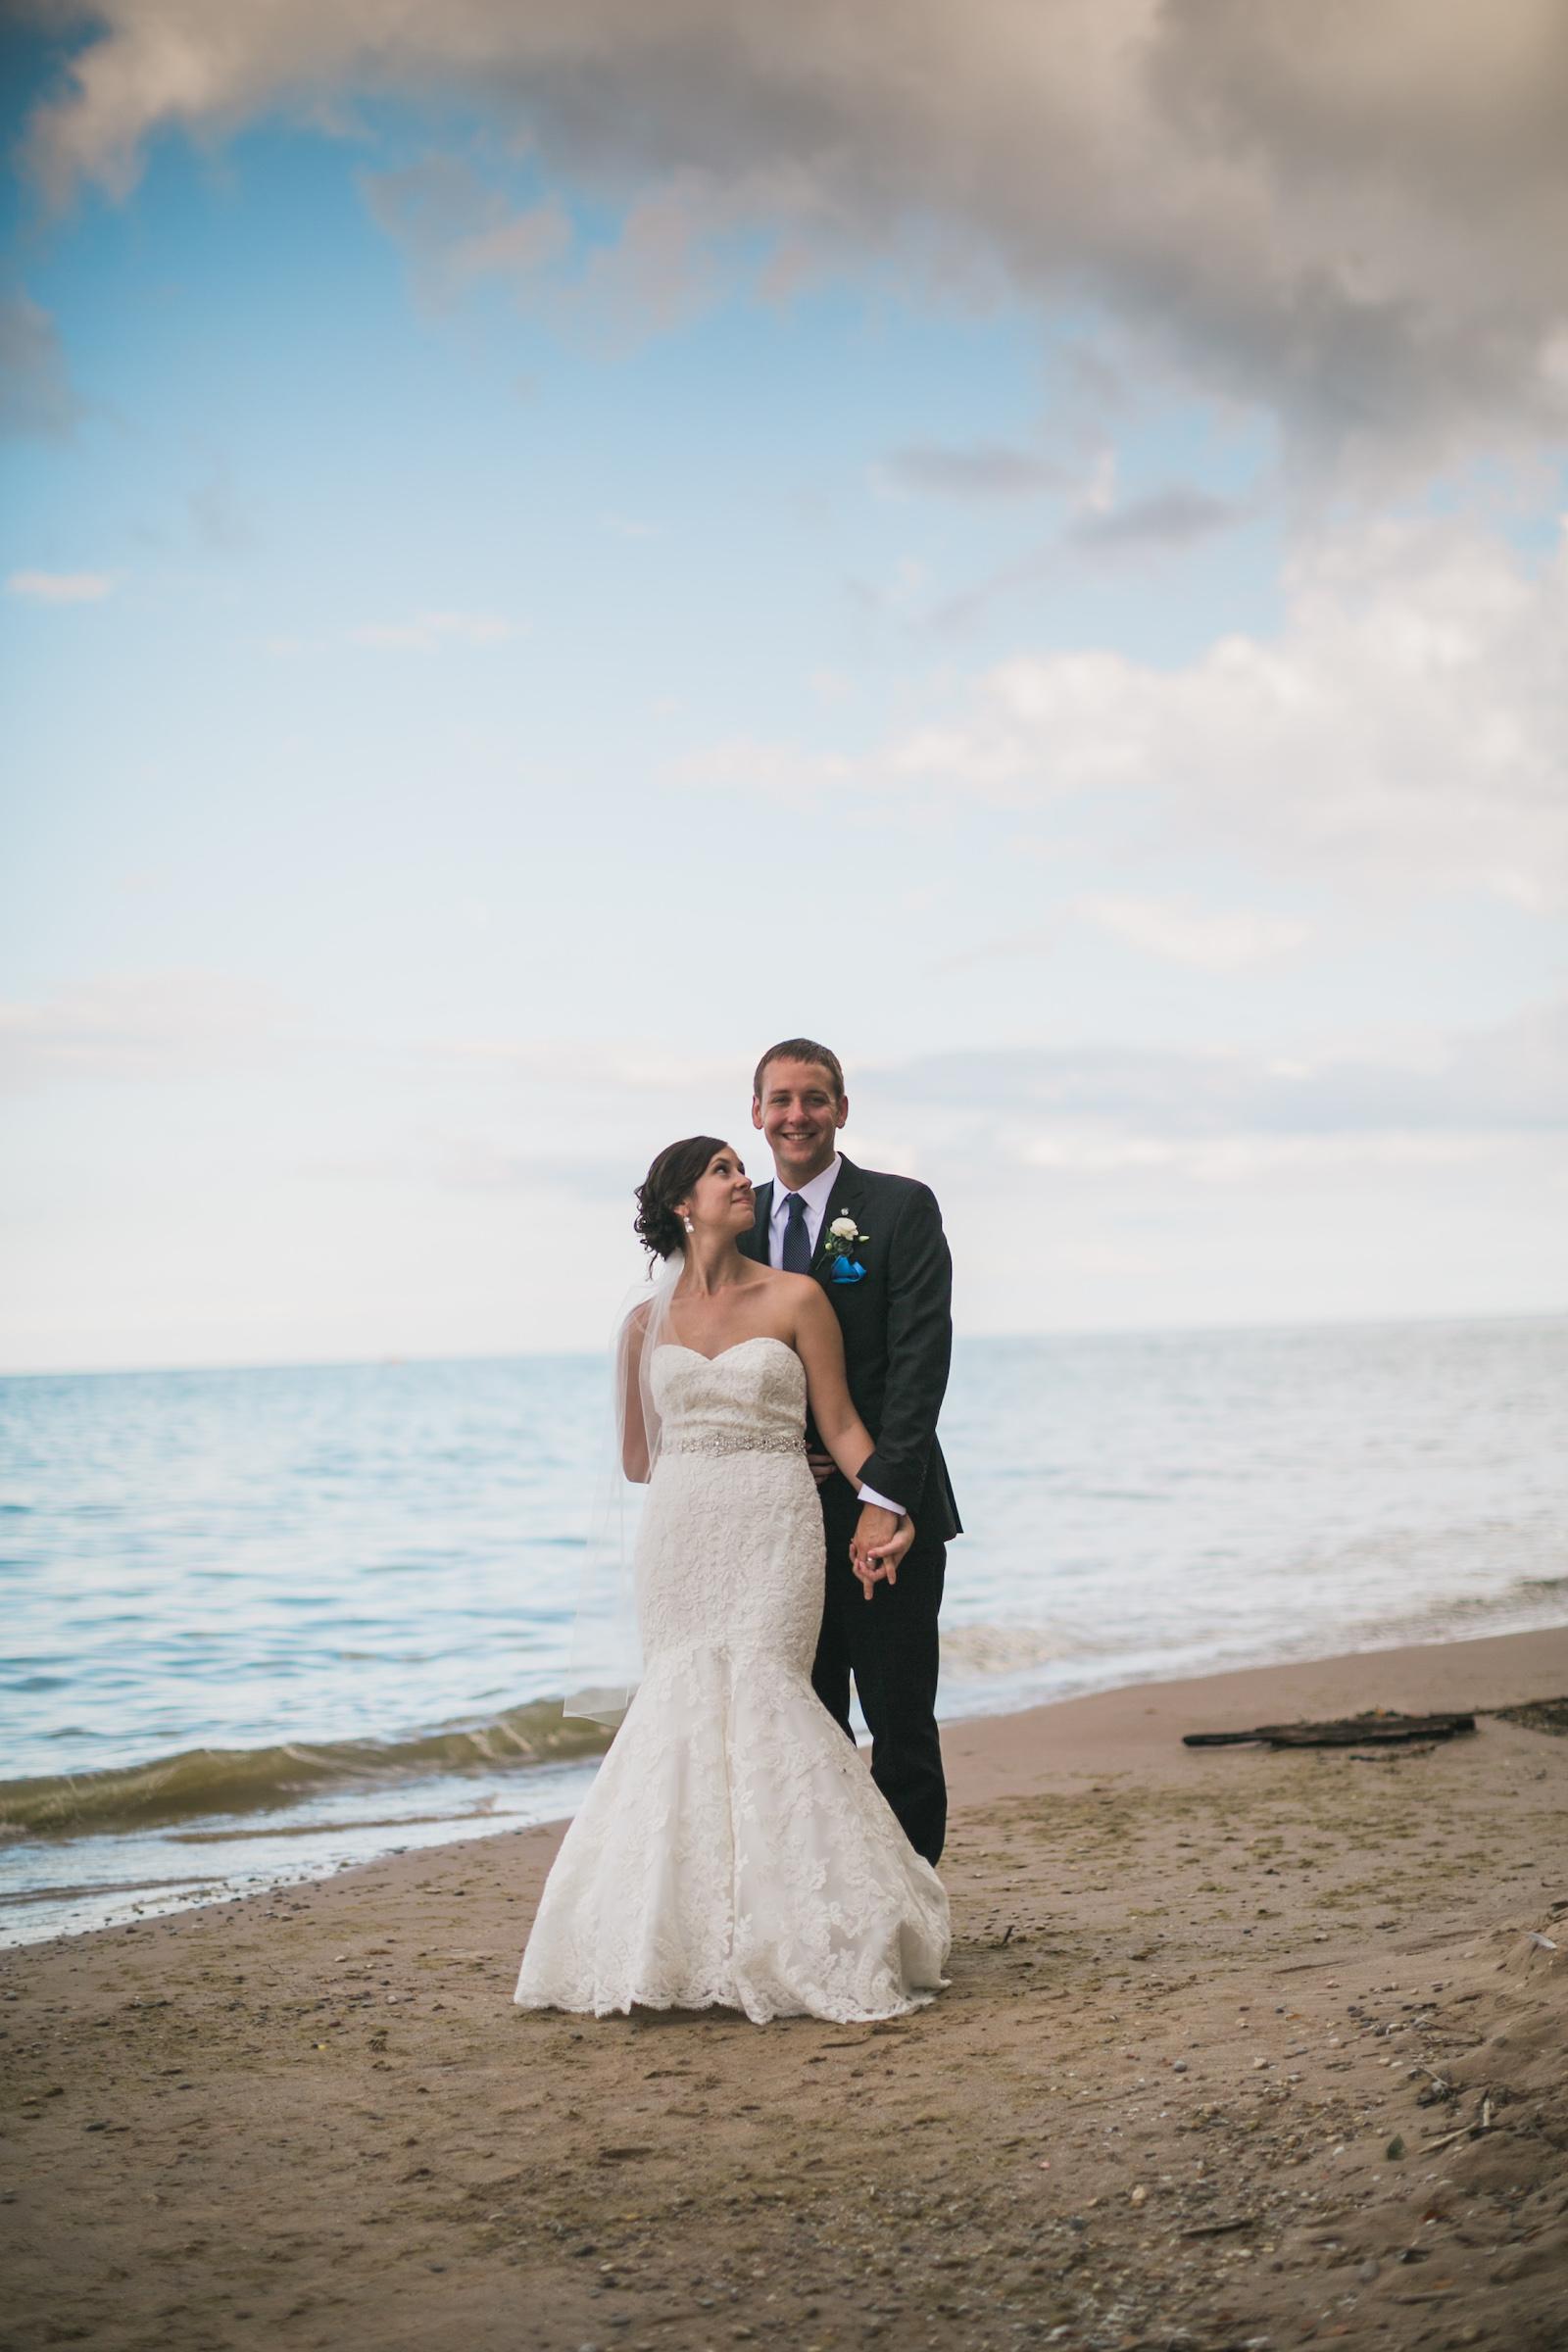 wisconsin-wedding-acowsay-uttke-photography-44.jpg